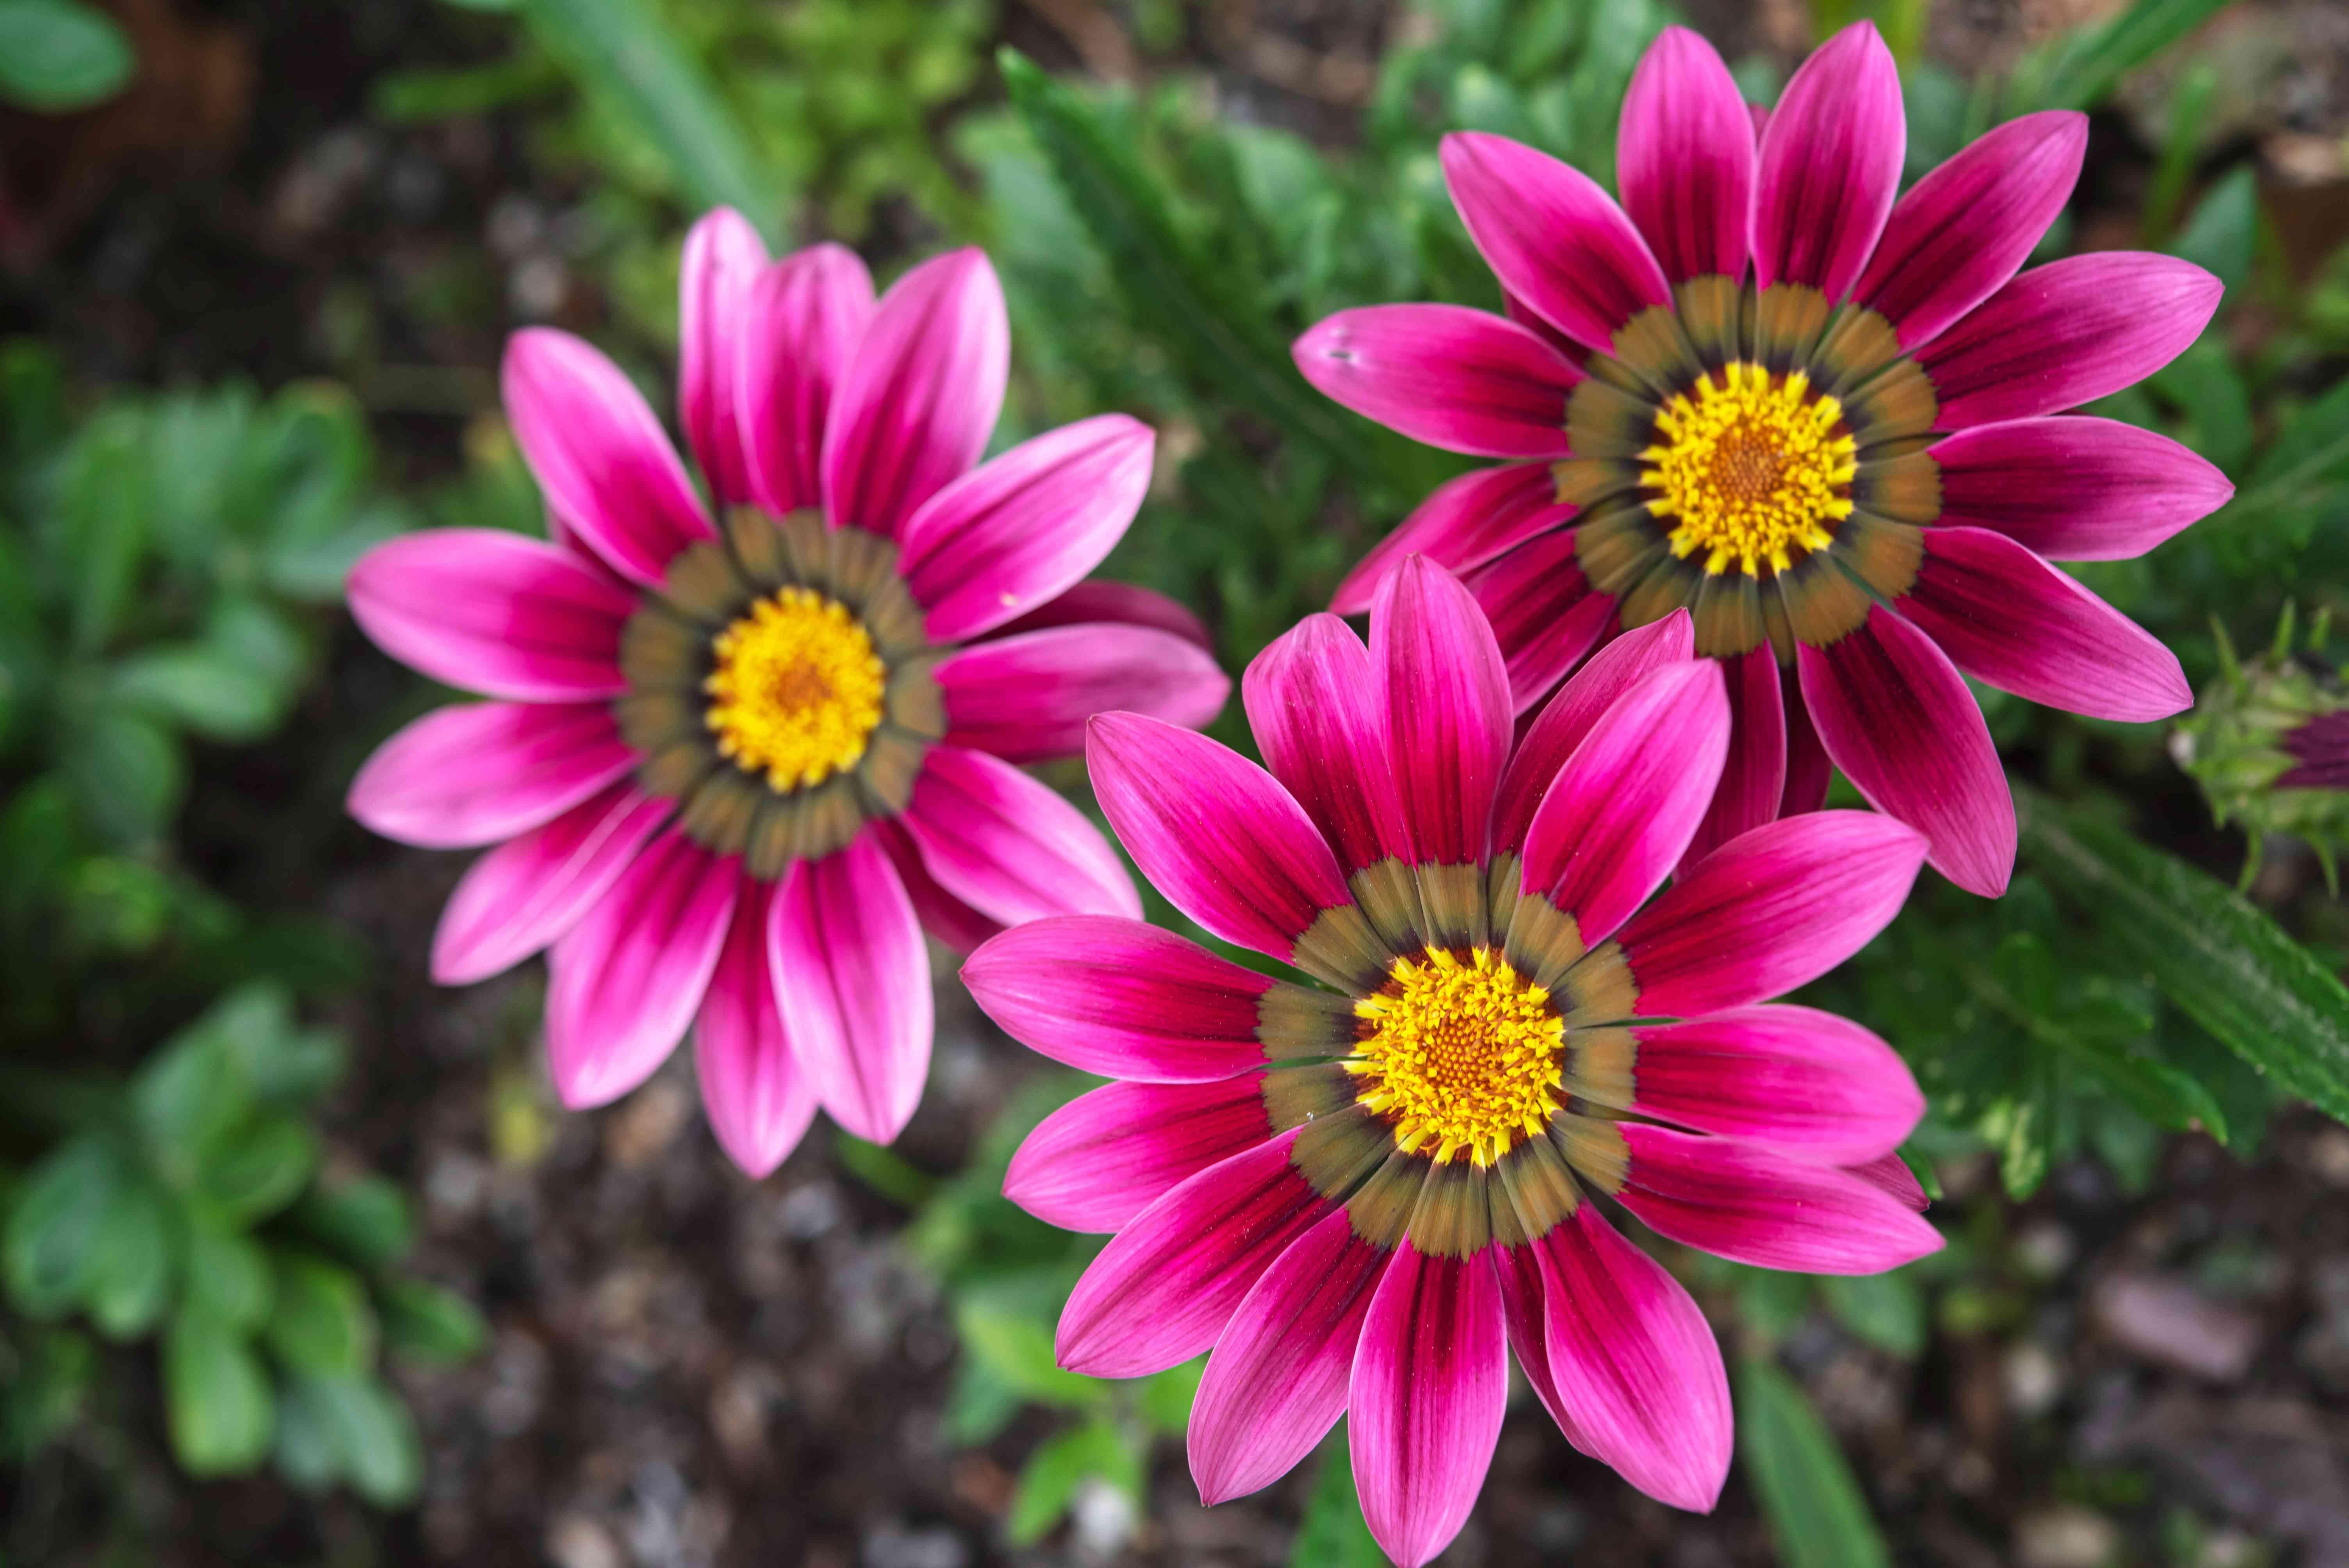 pink gazania flowers